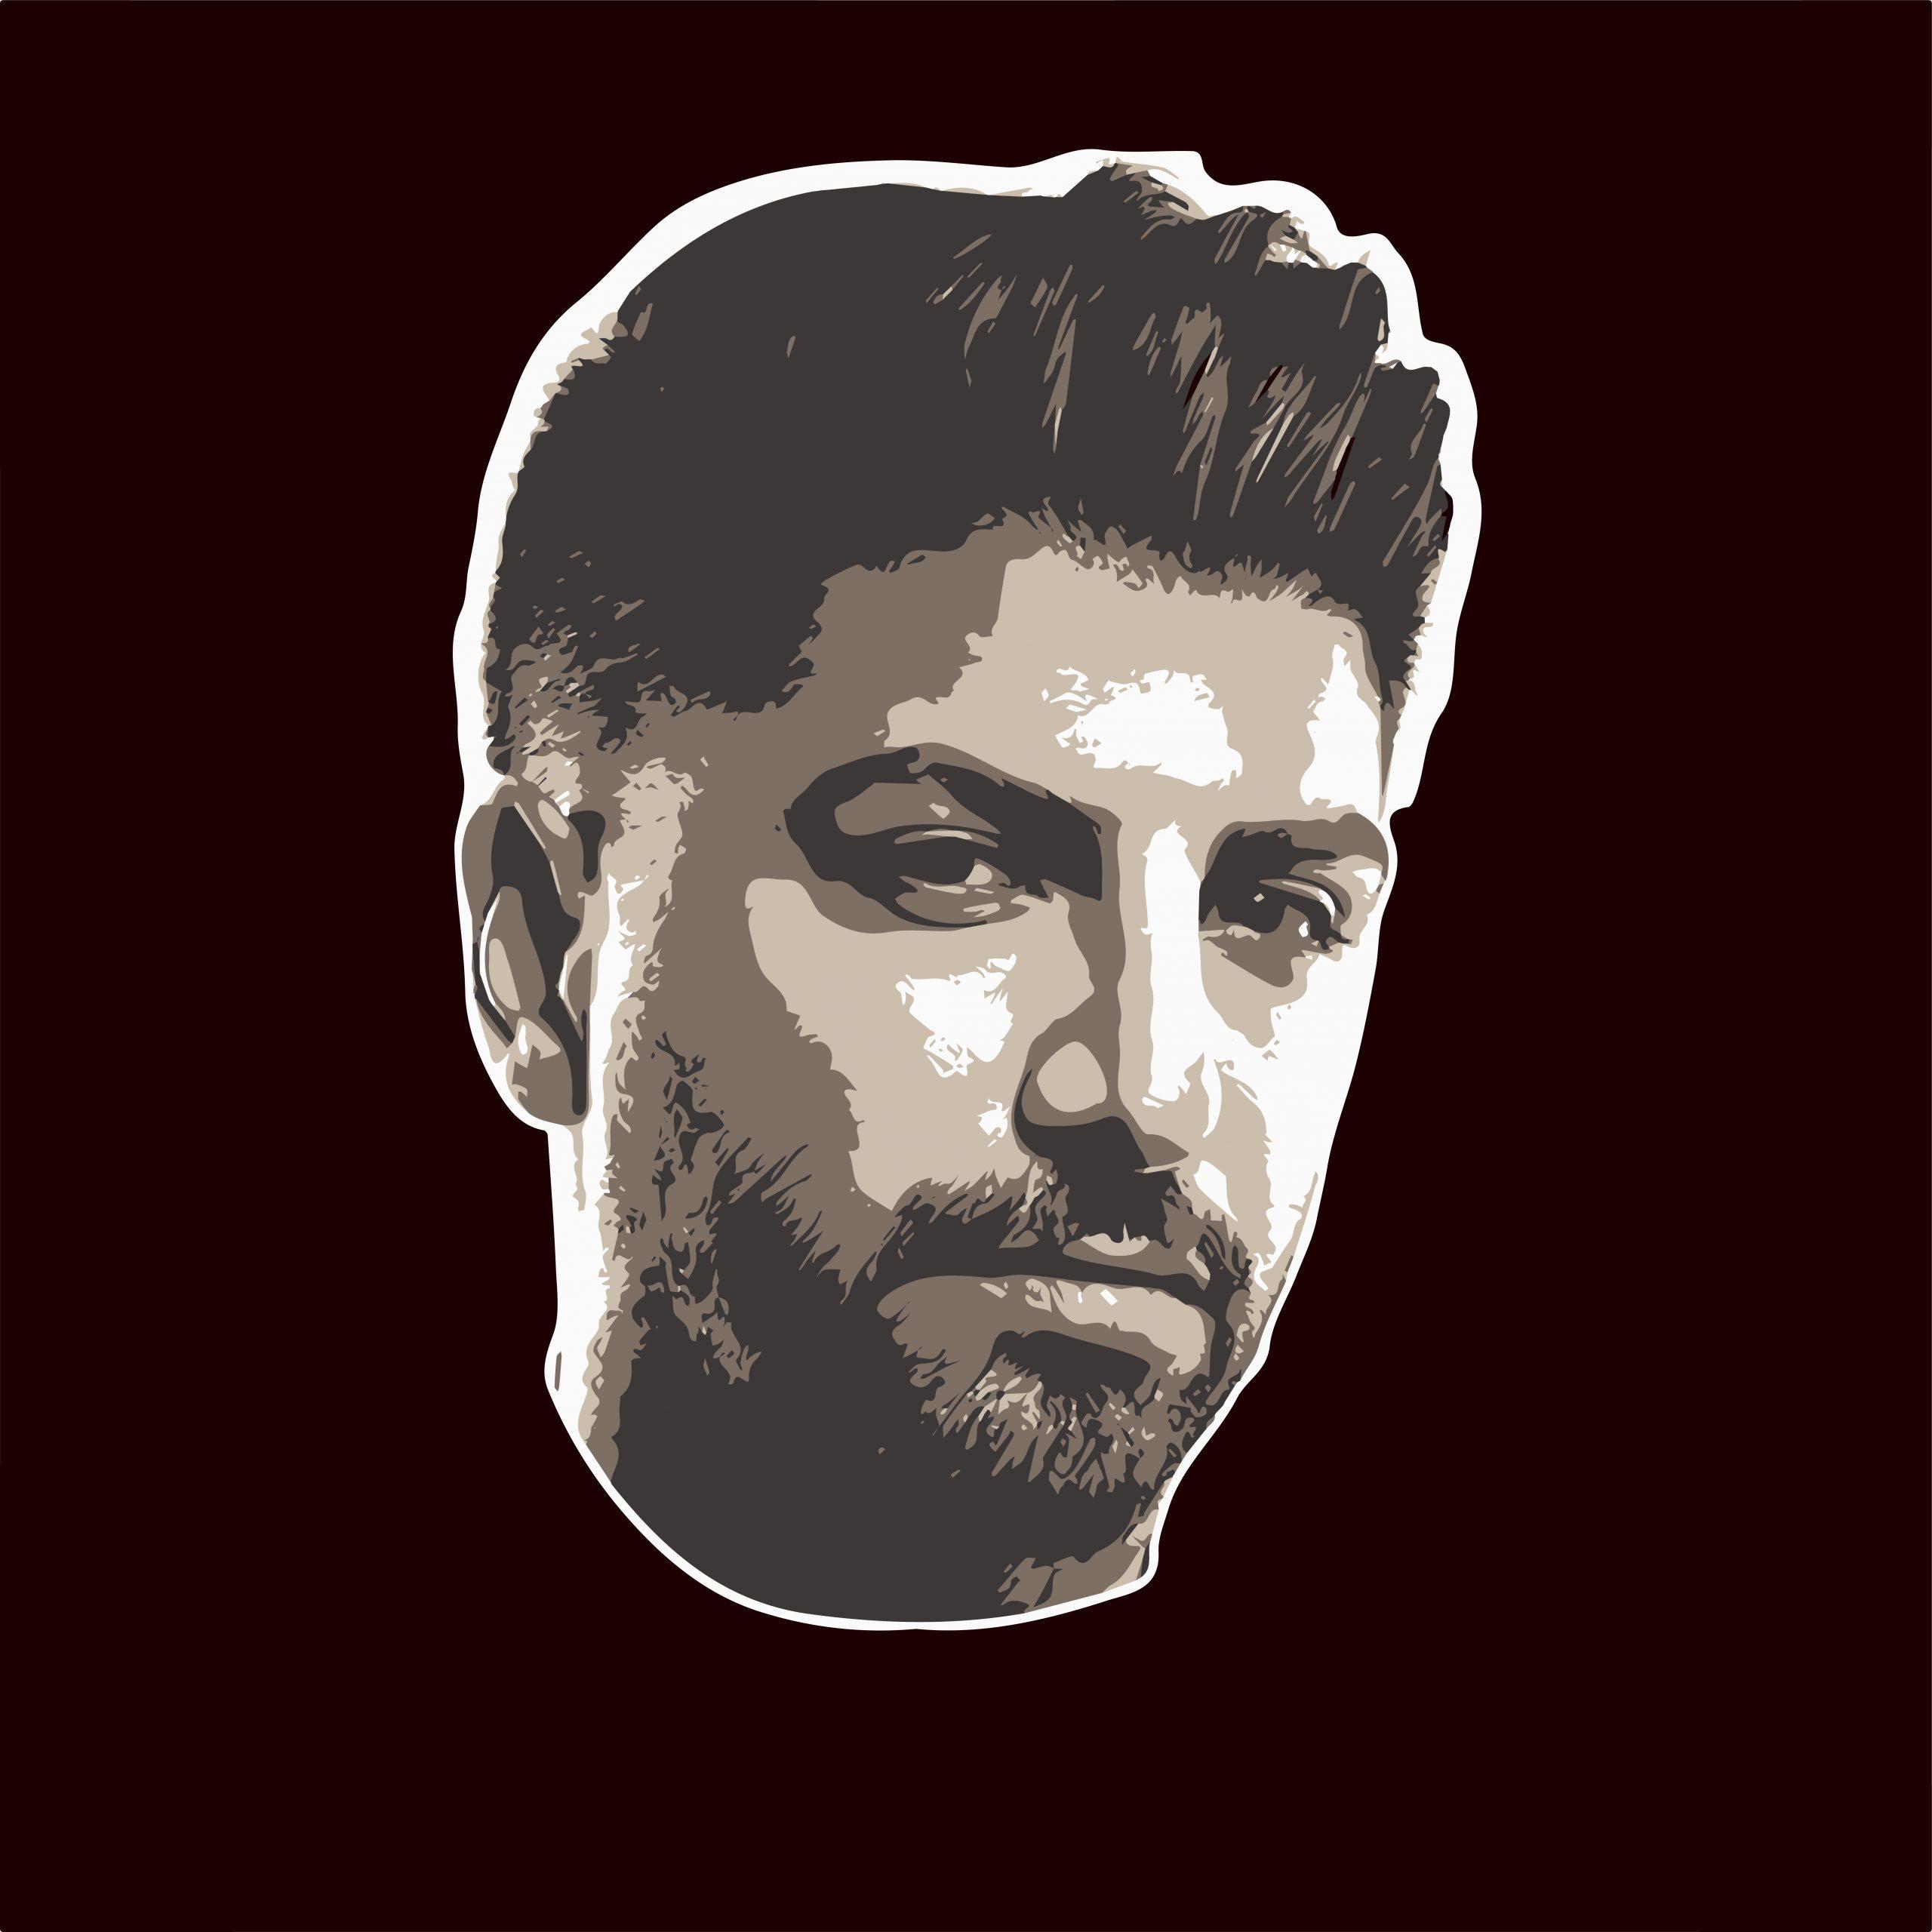 Creative Portrait Illustration